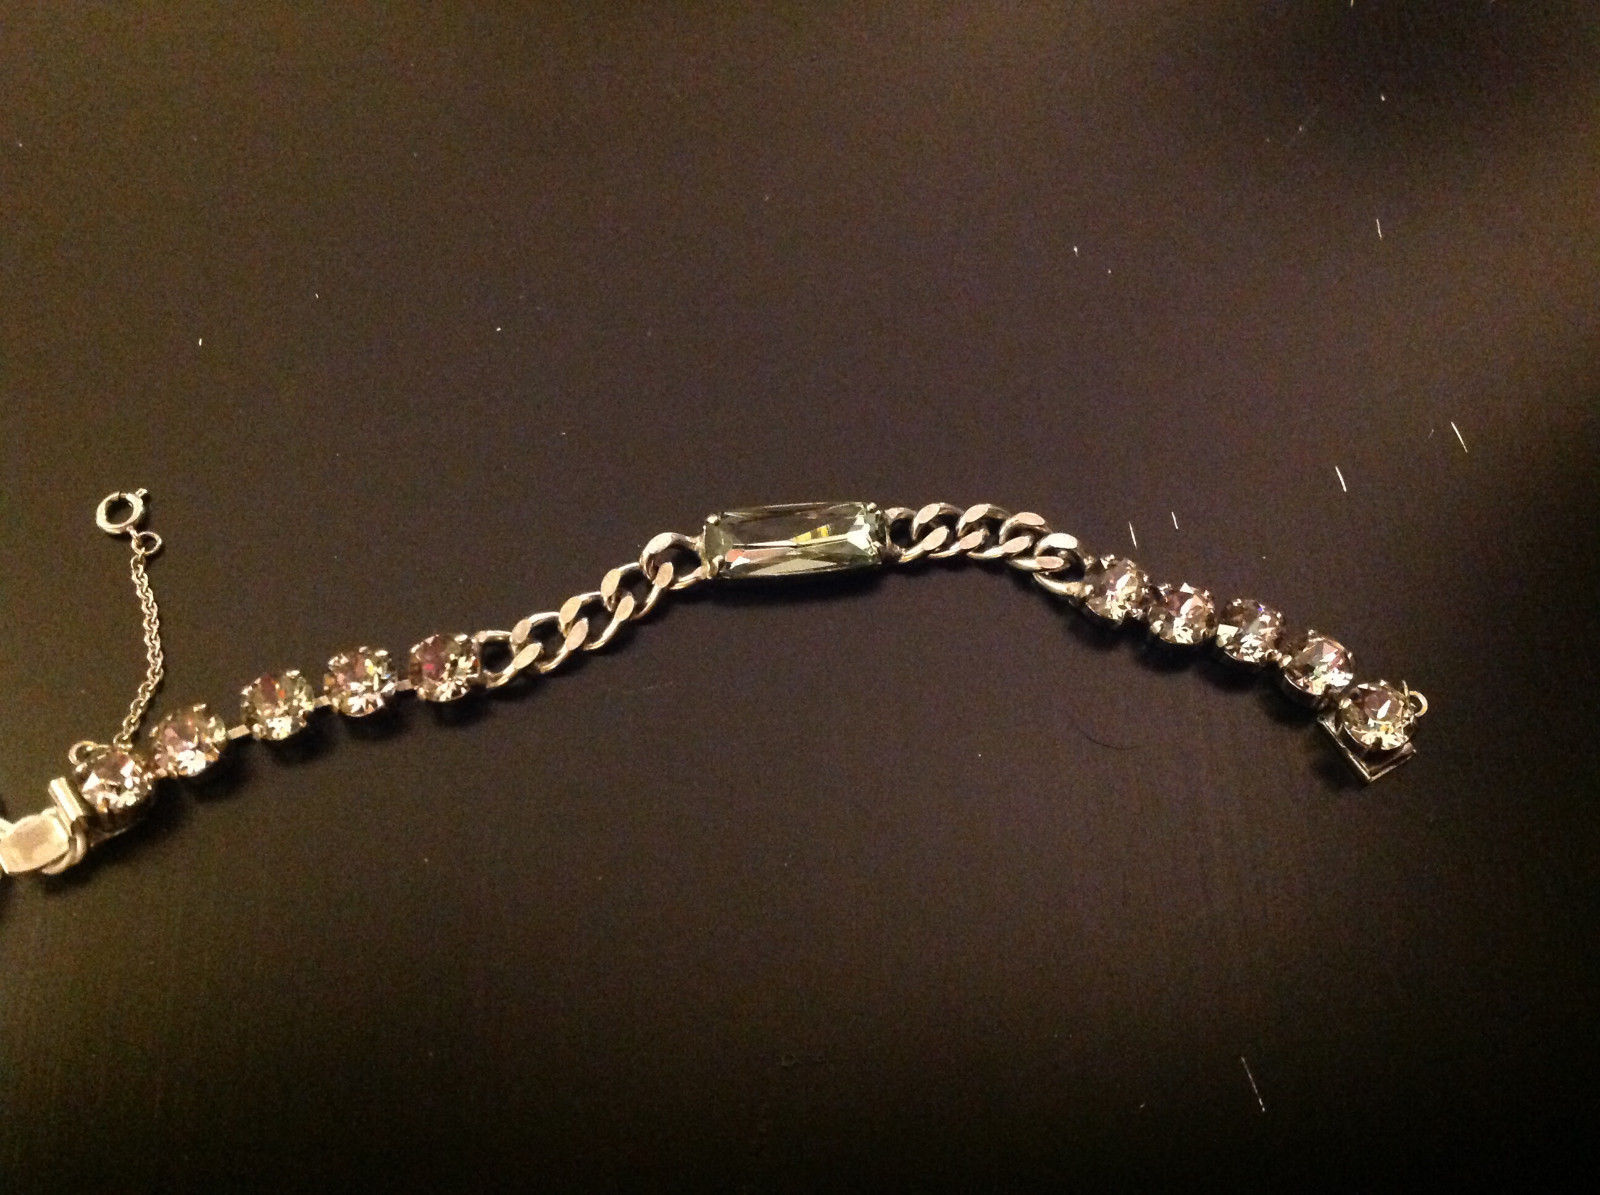 New Sorrelli Chain Purple Lotus Bracelet 7.5 inches Long